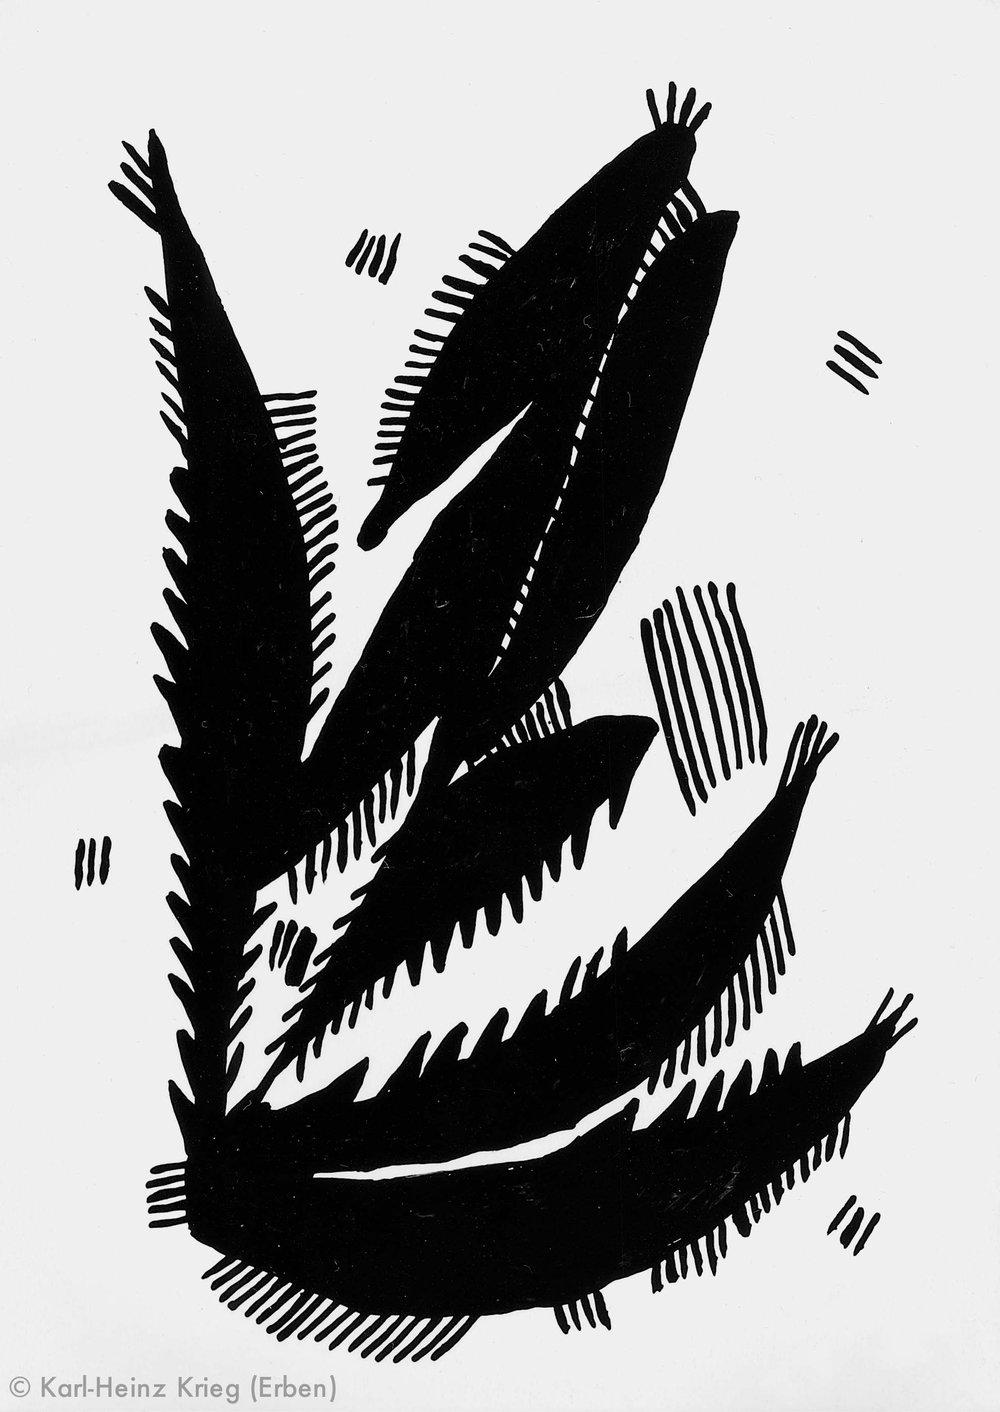 Akoi Zoumanigi Blattornament, Bhékpégi, 1996 Acryl/Papier, grundiert 40,8 x 29,1 cm Werknr. 38-1996/93